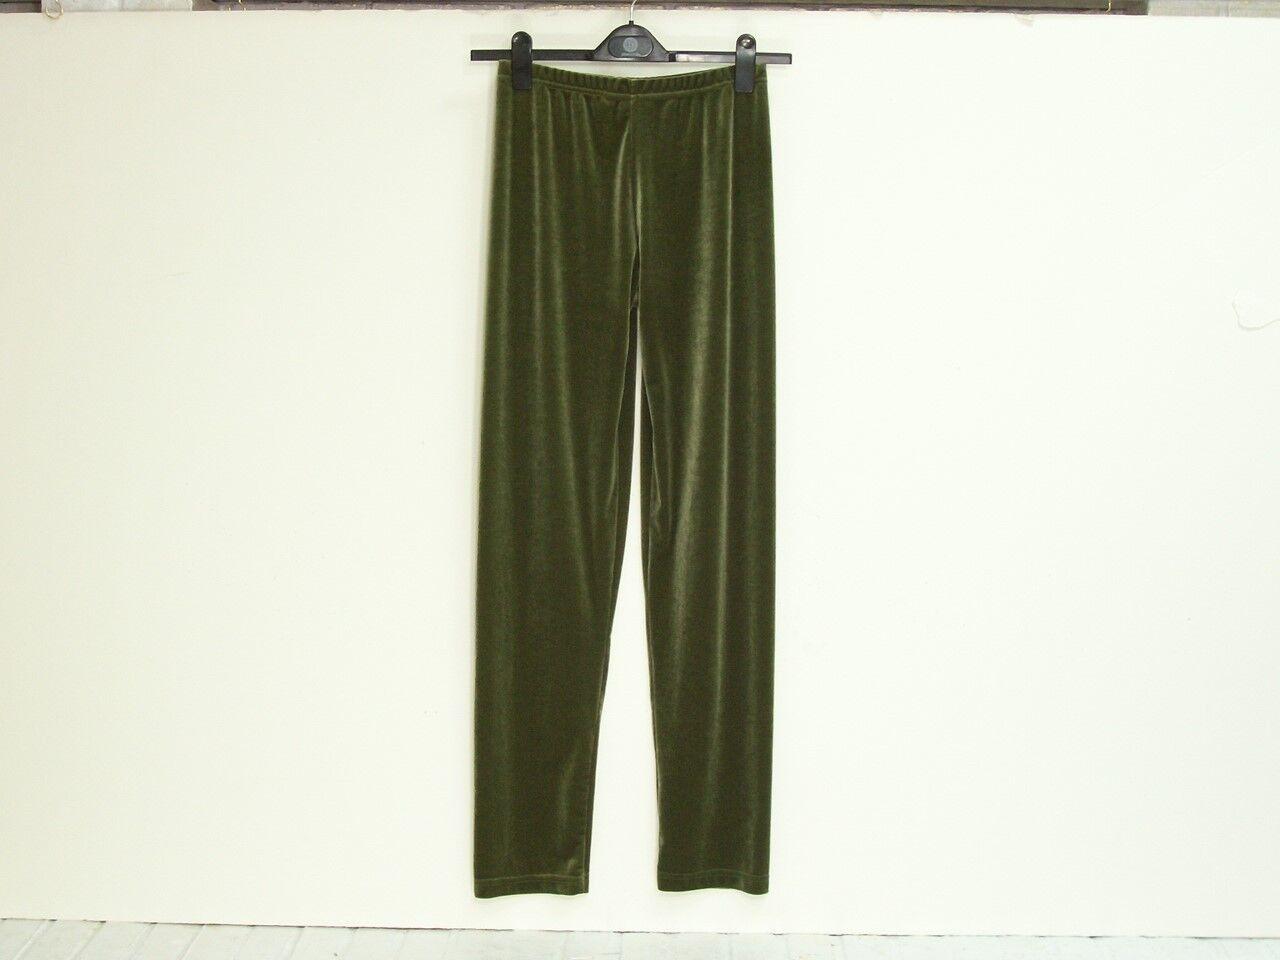 NWT California STYLE Plush Tech Stretch Velvet Leggings Soft Sage Grün Größe M